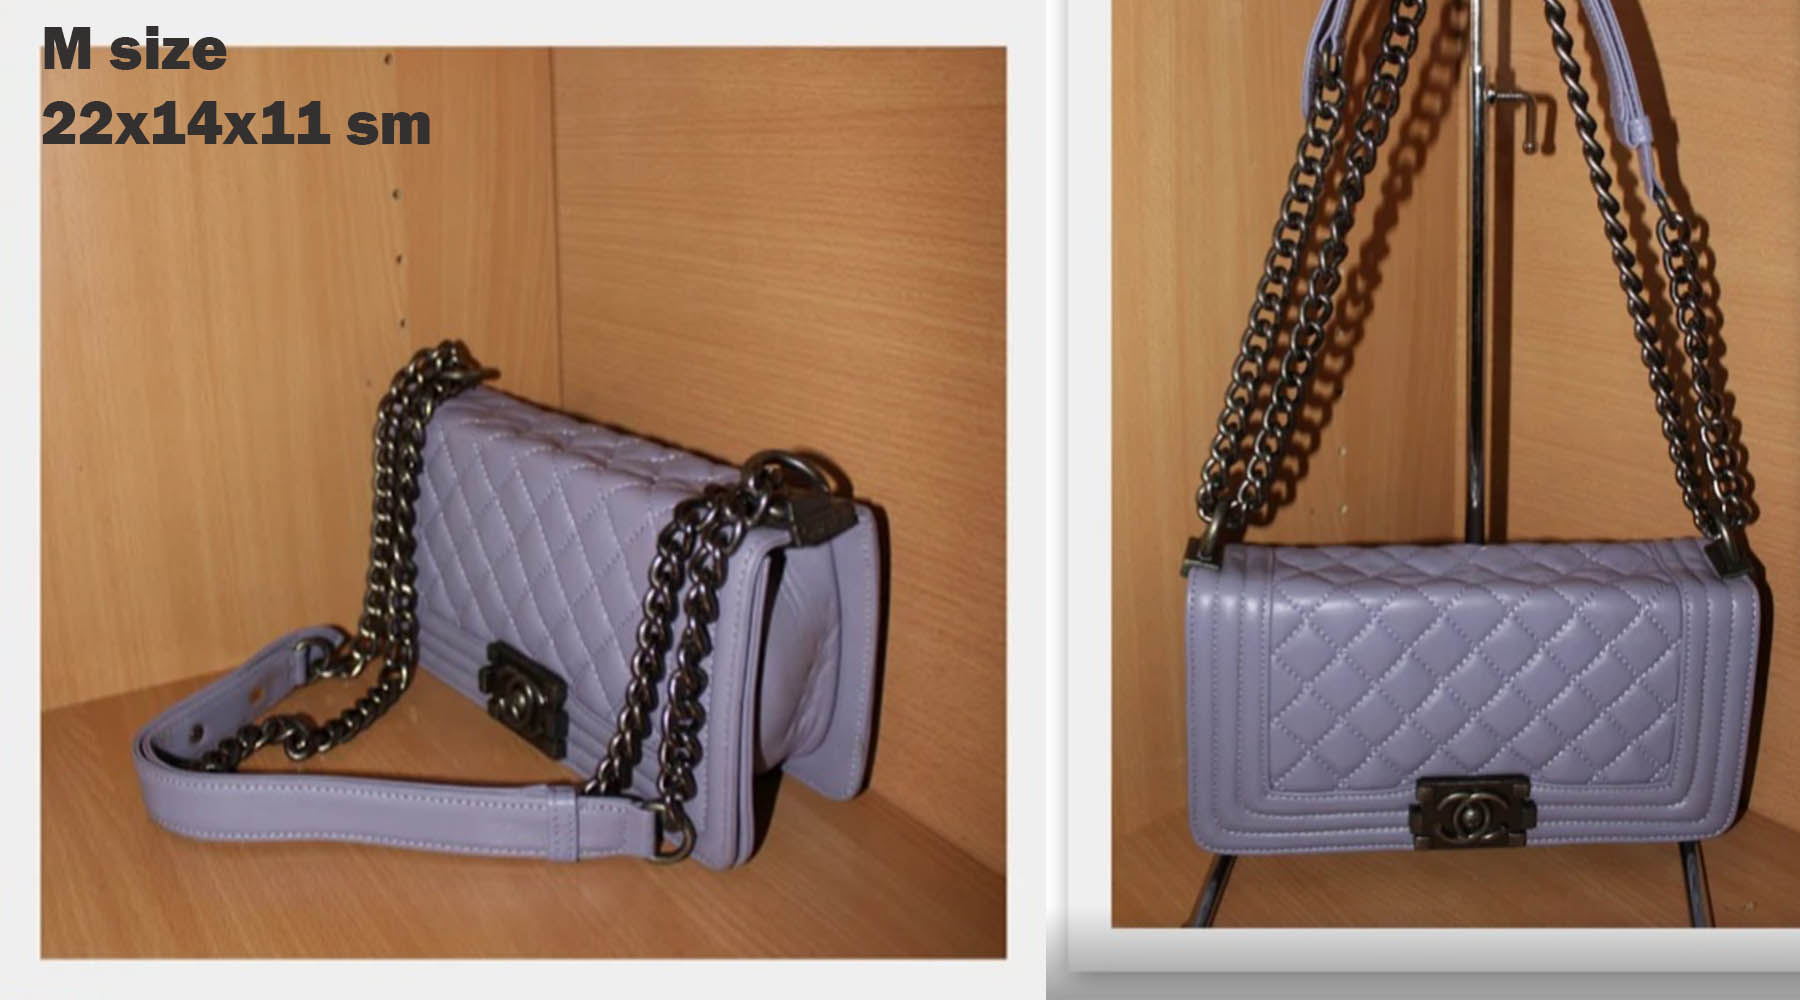 Дамска чанта ШАНЕЛ BLUE, S размер 22 х 11 х 14 см